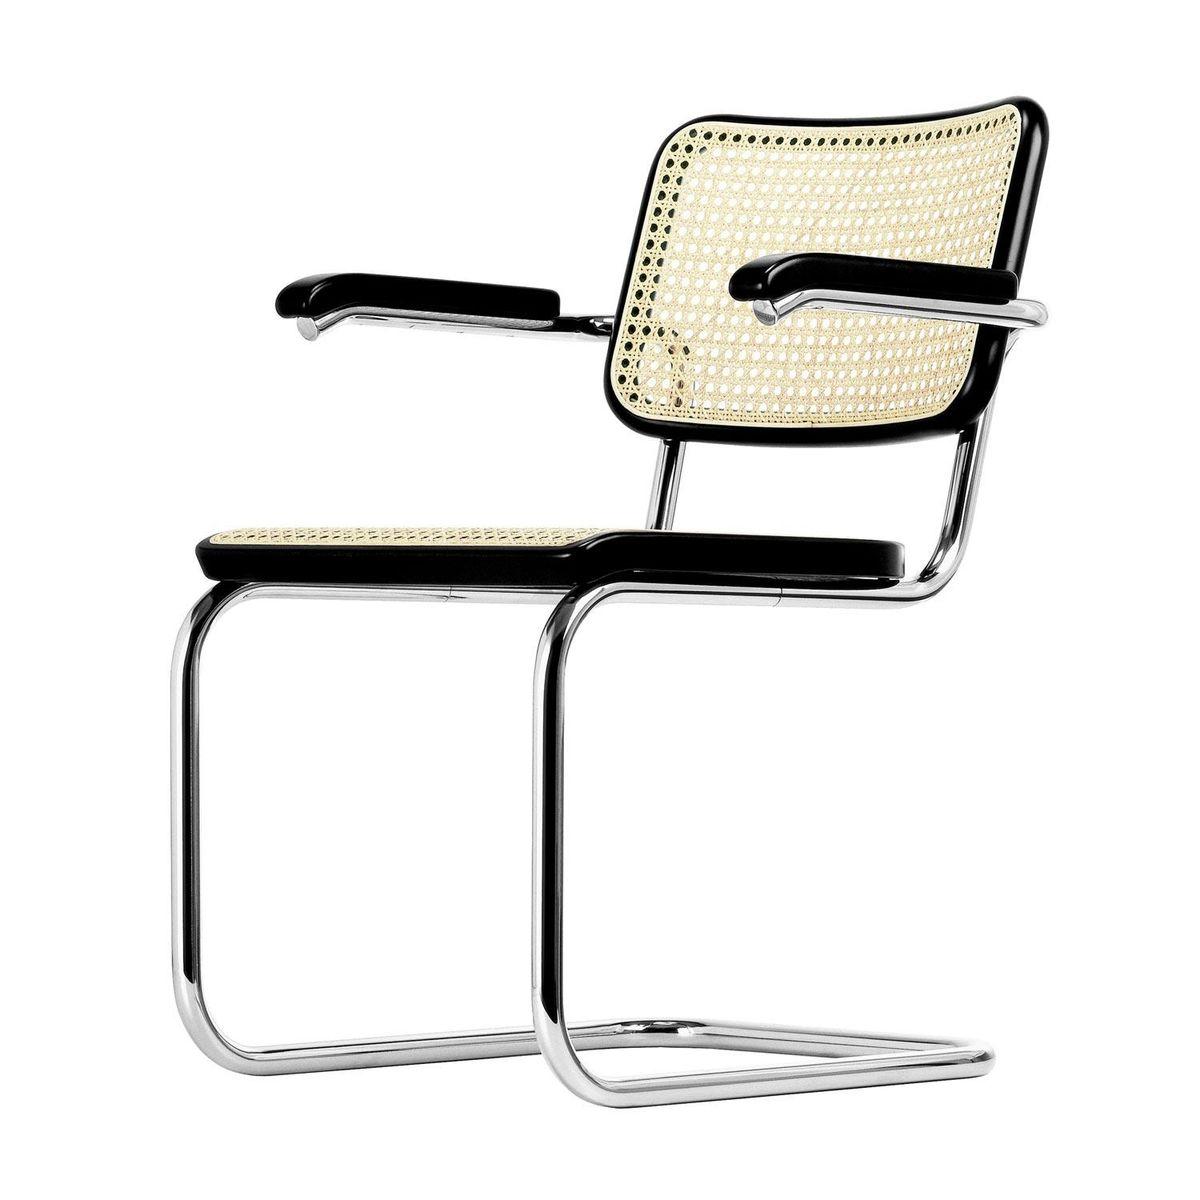 thonet s 64 fauteuil cantilever thonet. Black Bedroom Furniture Sets. Home Design Ideas